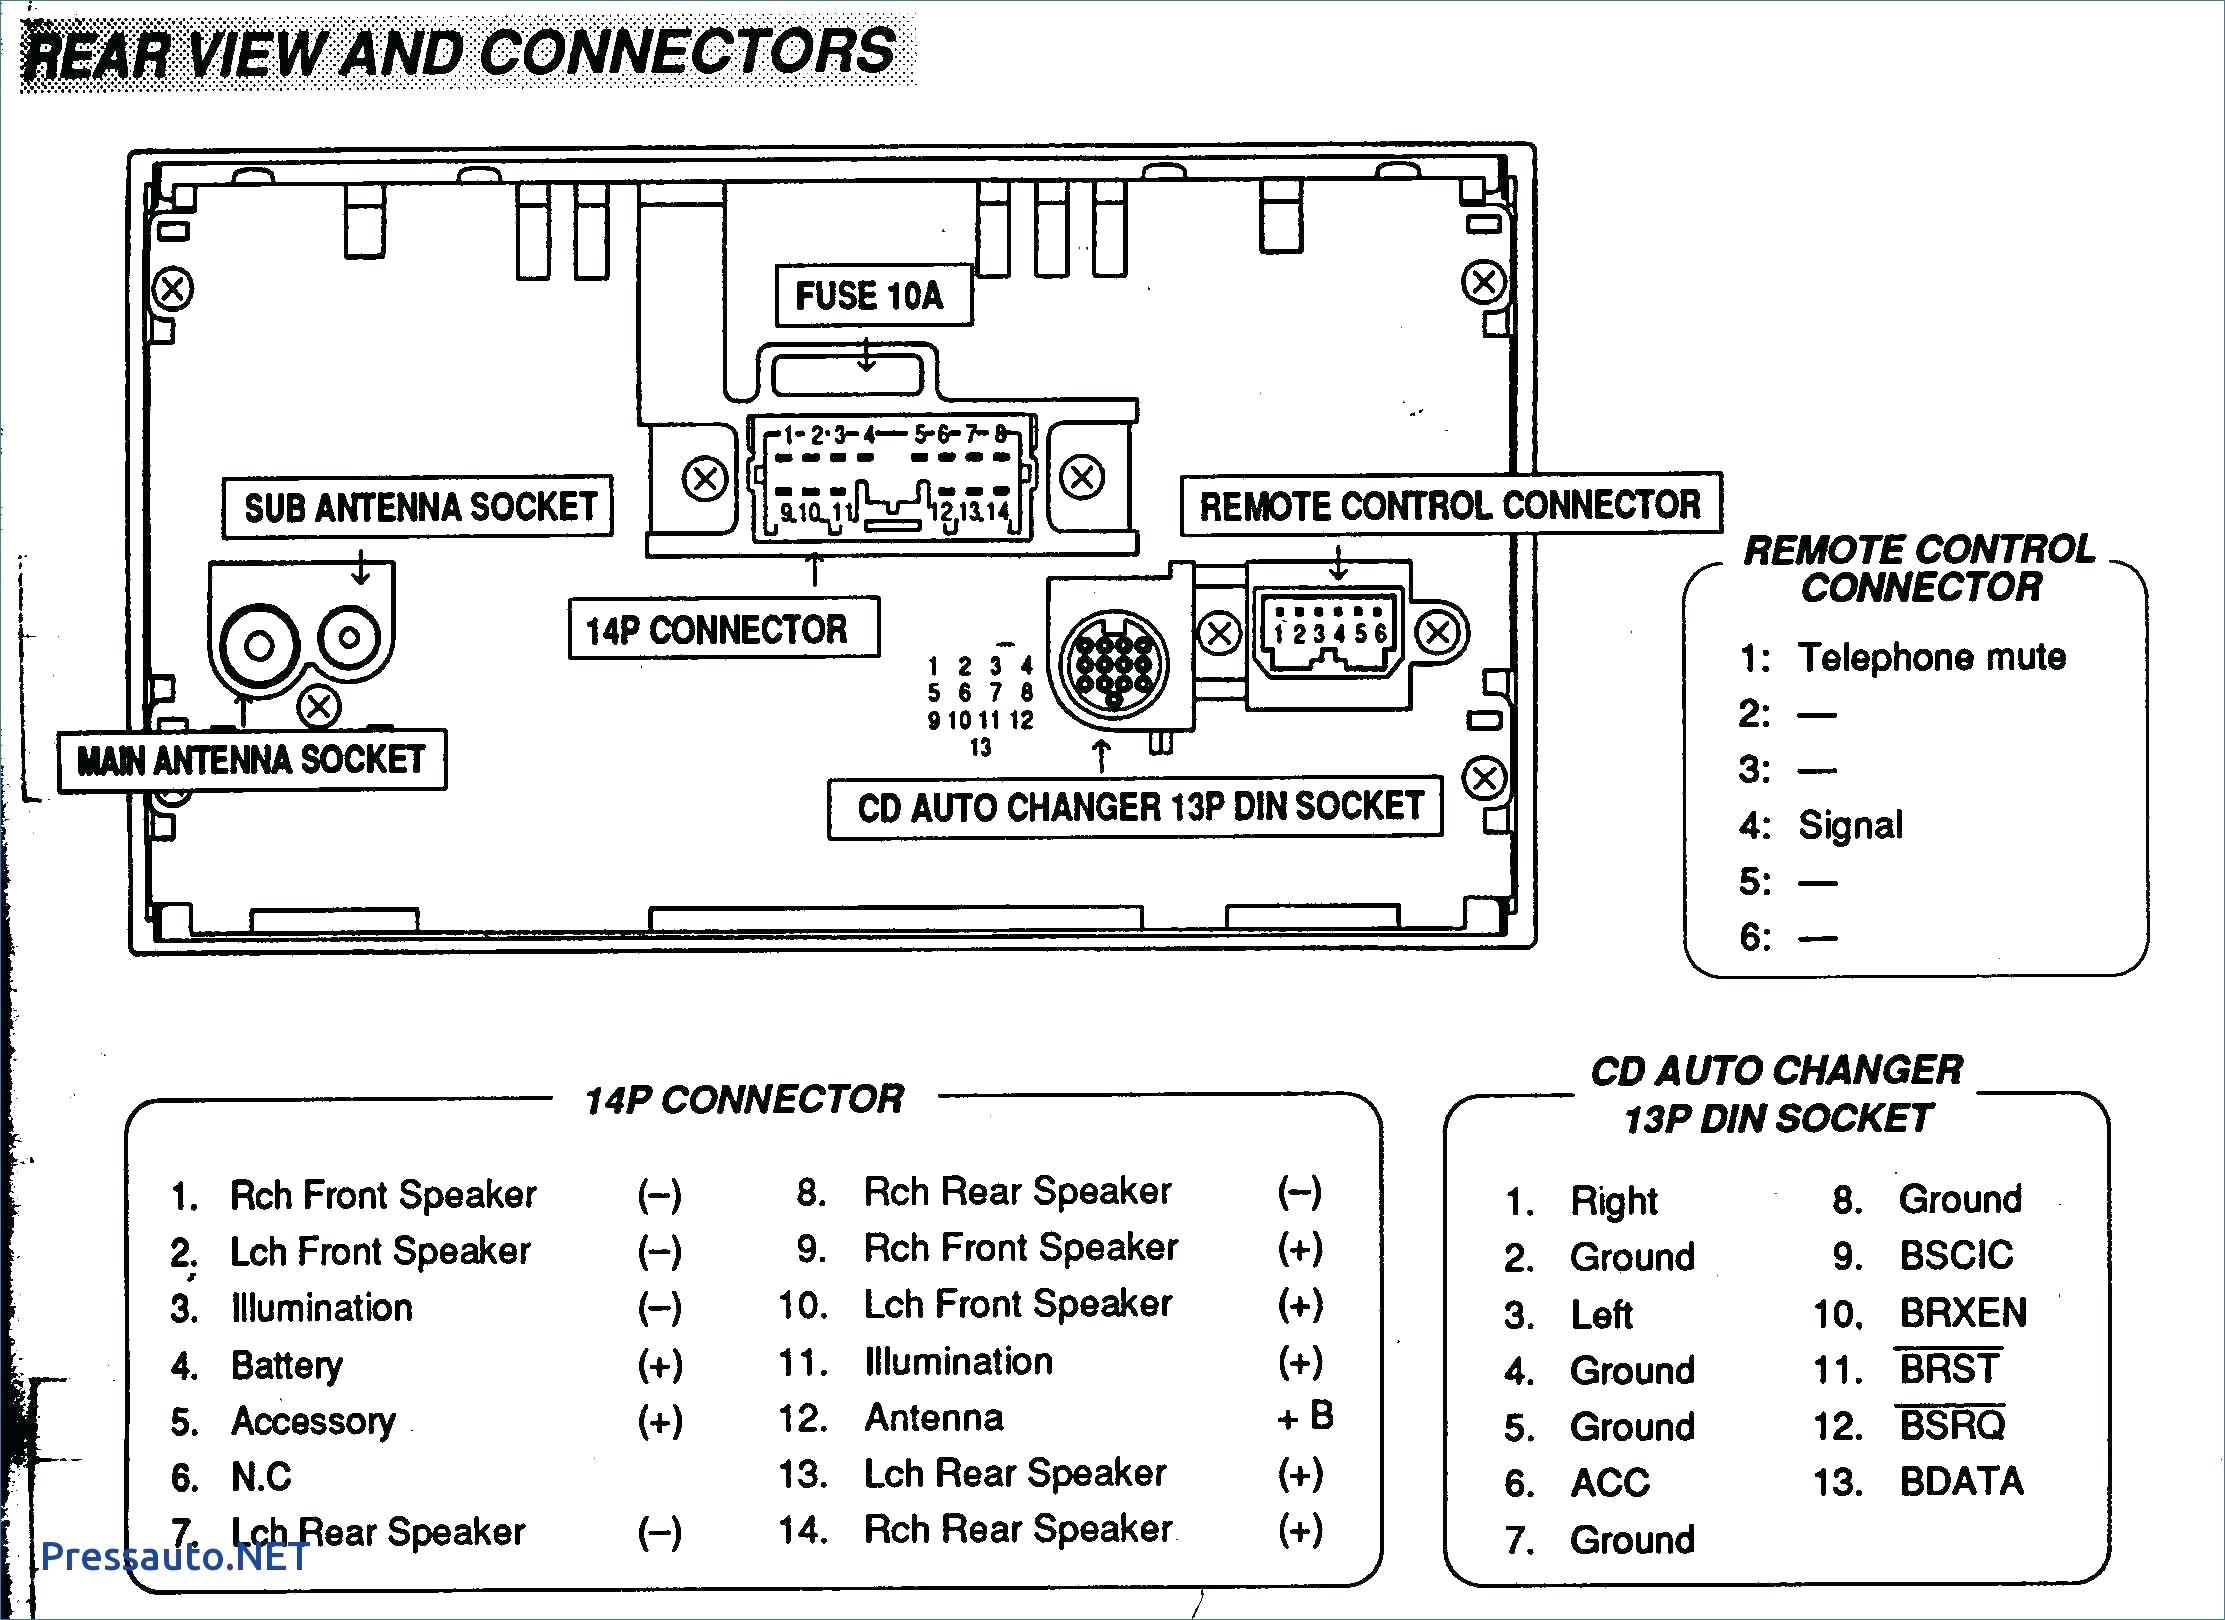 2007 scion tc stereo wiring diagram Download-2007 Scion Tc Stereo Wiring Diagram 2007 Scion Tc Radio Wiring Diagram Fresh Volvo Ac 4-d